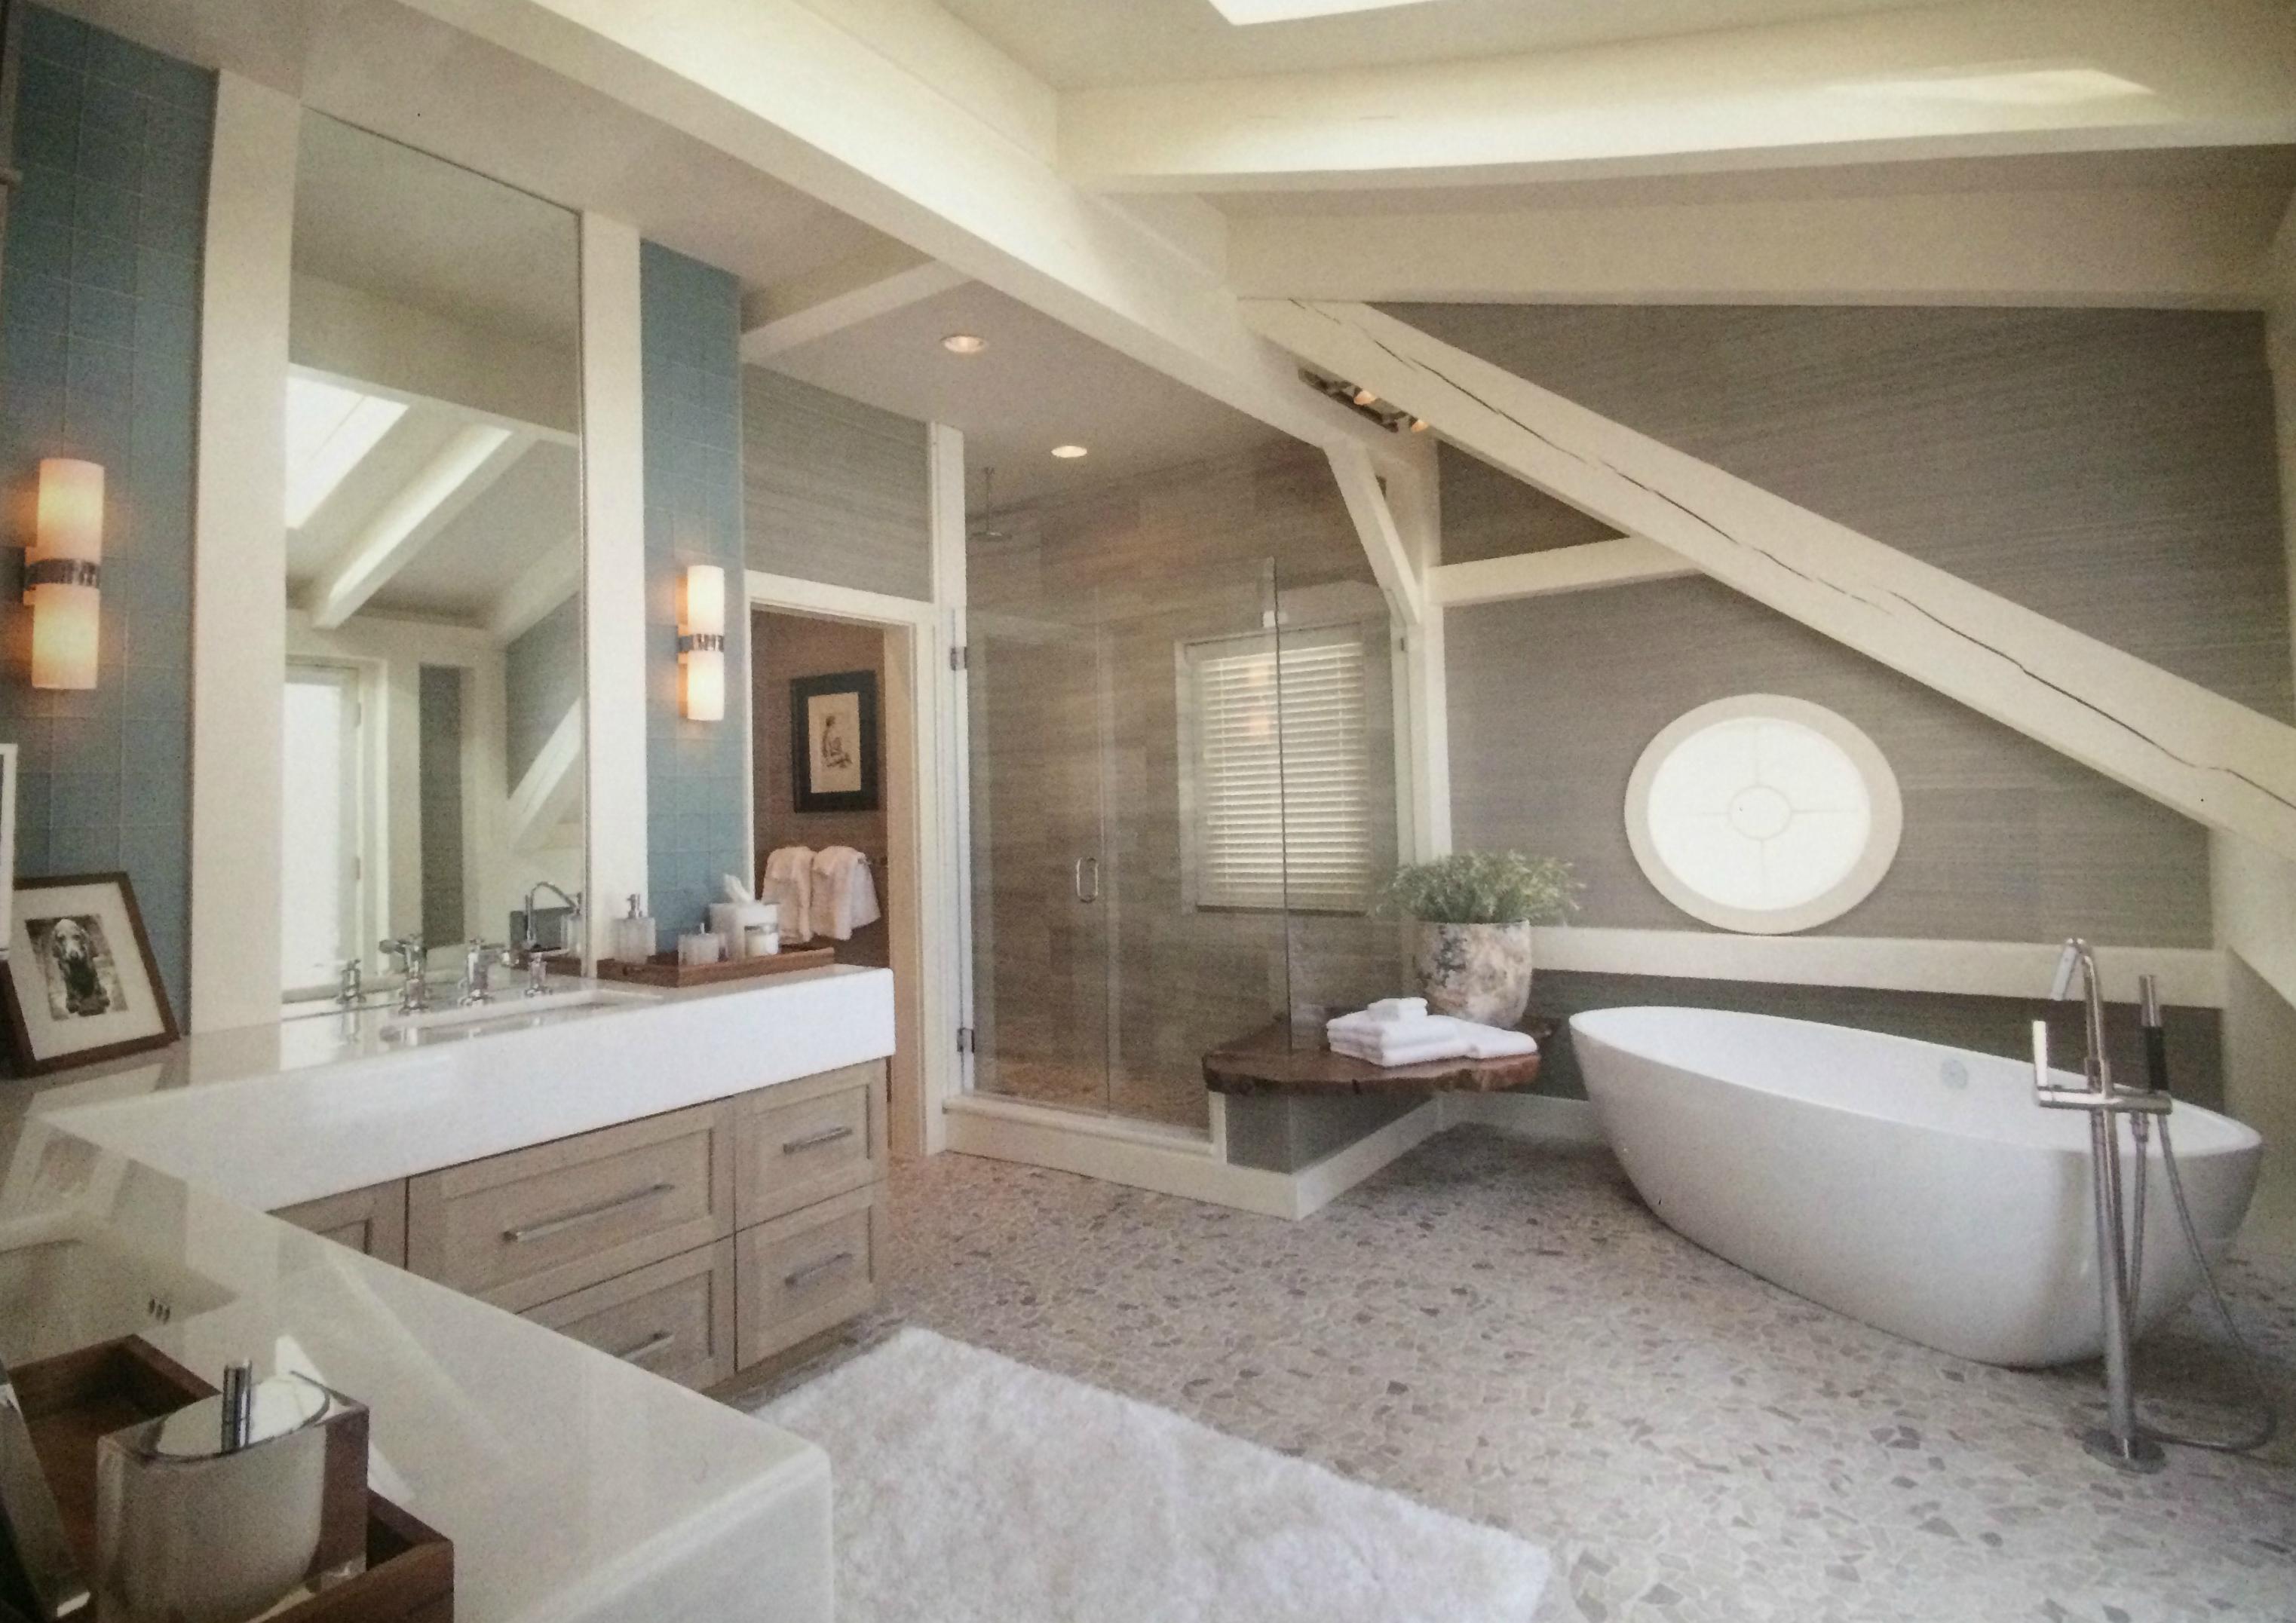 Featured Kountry Kraft Bath